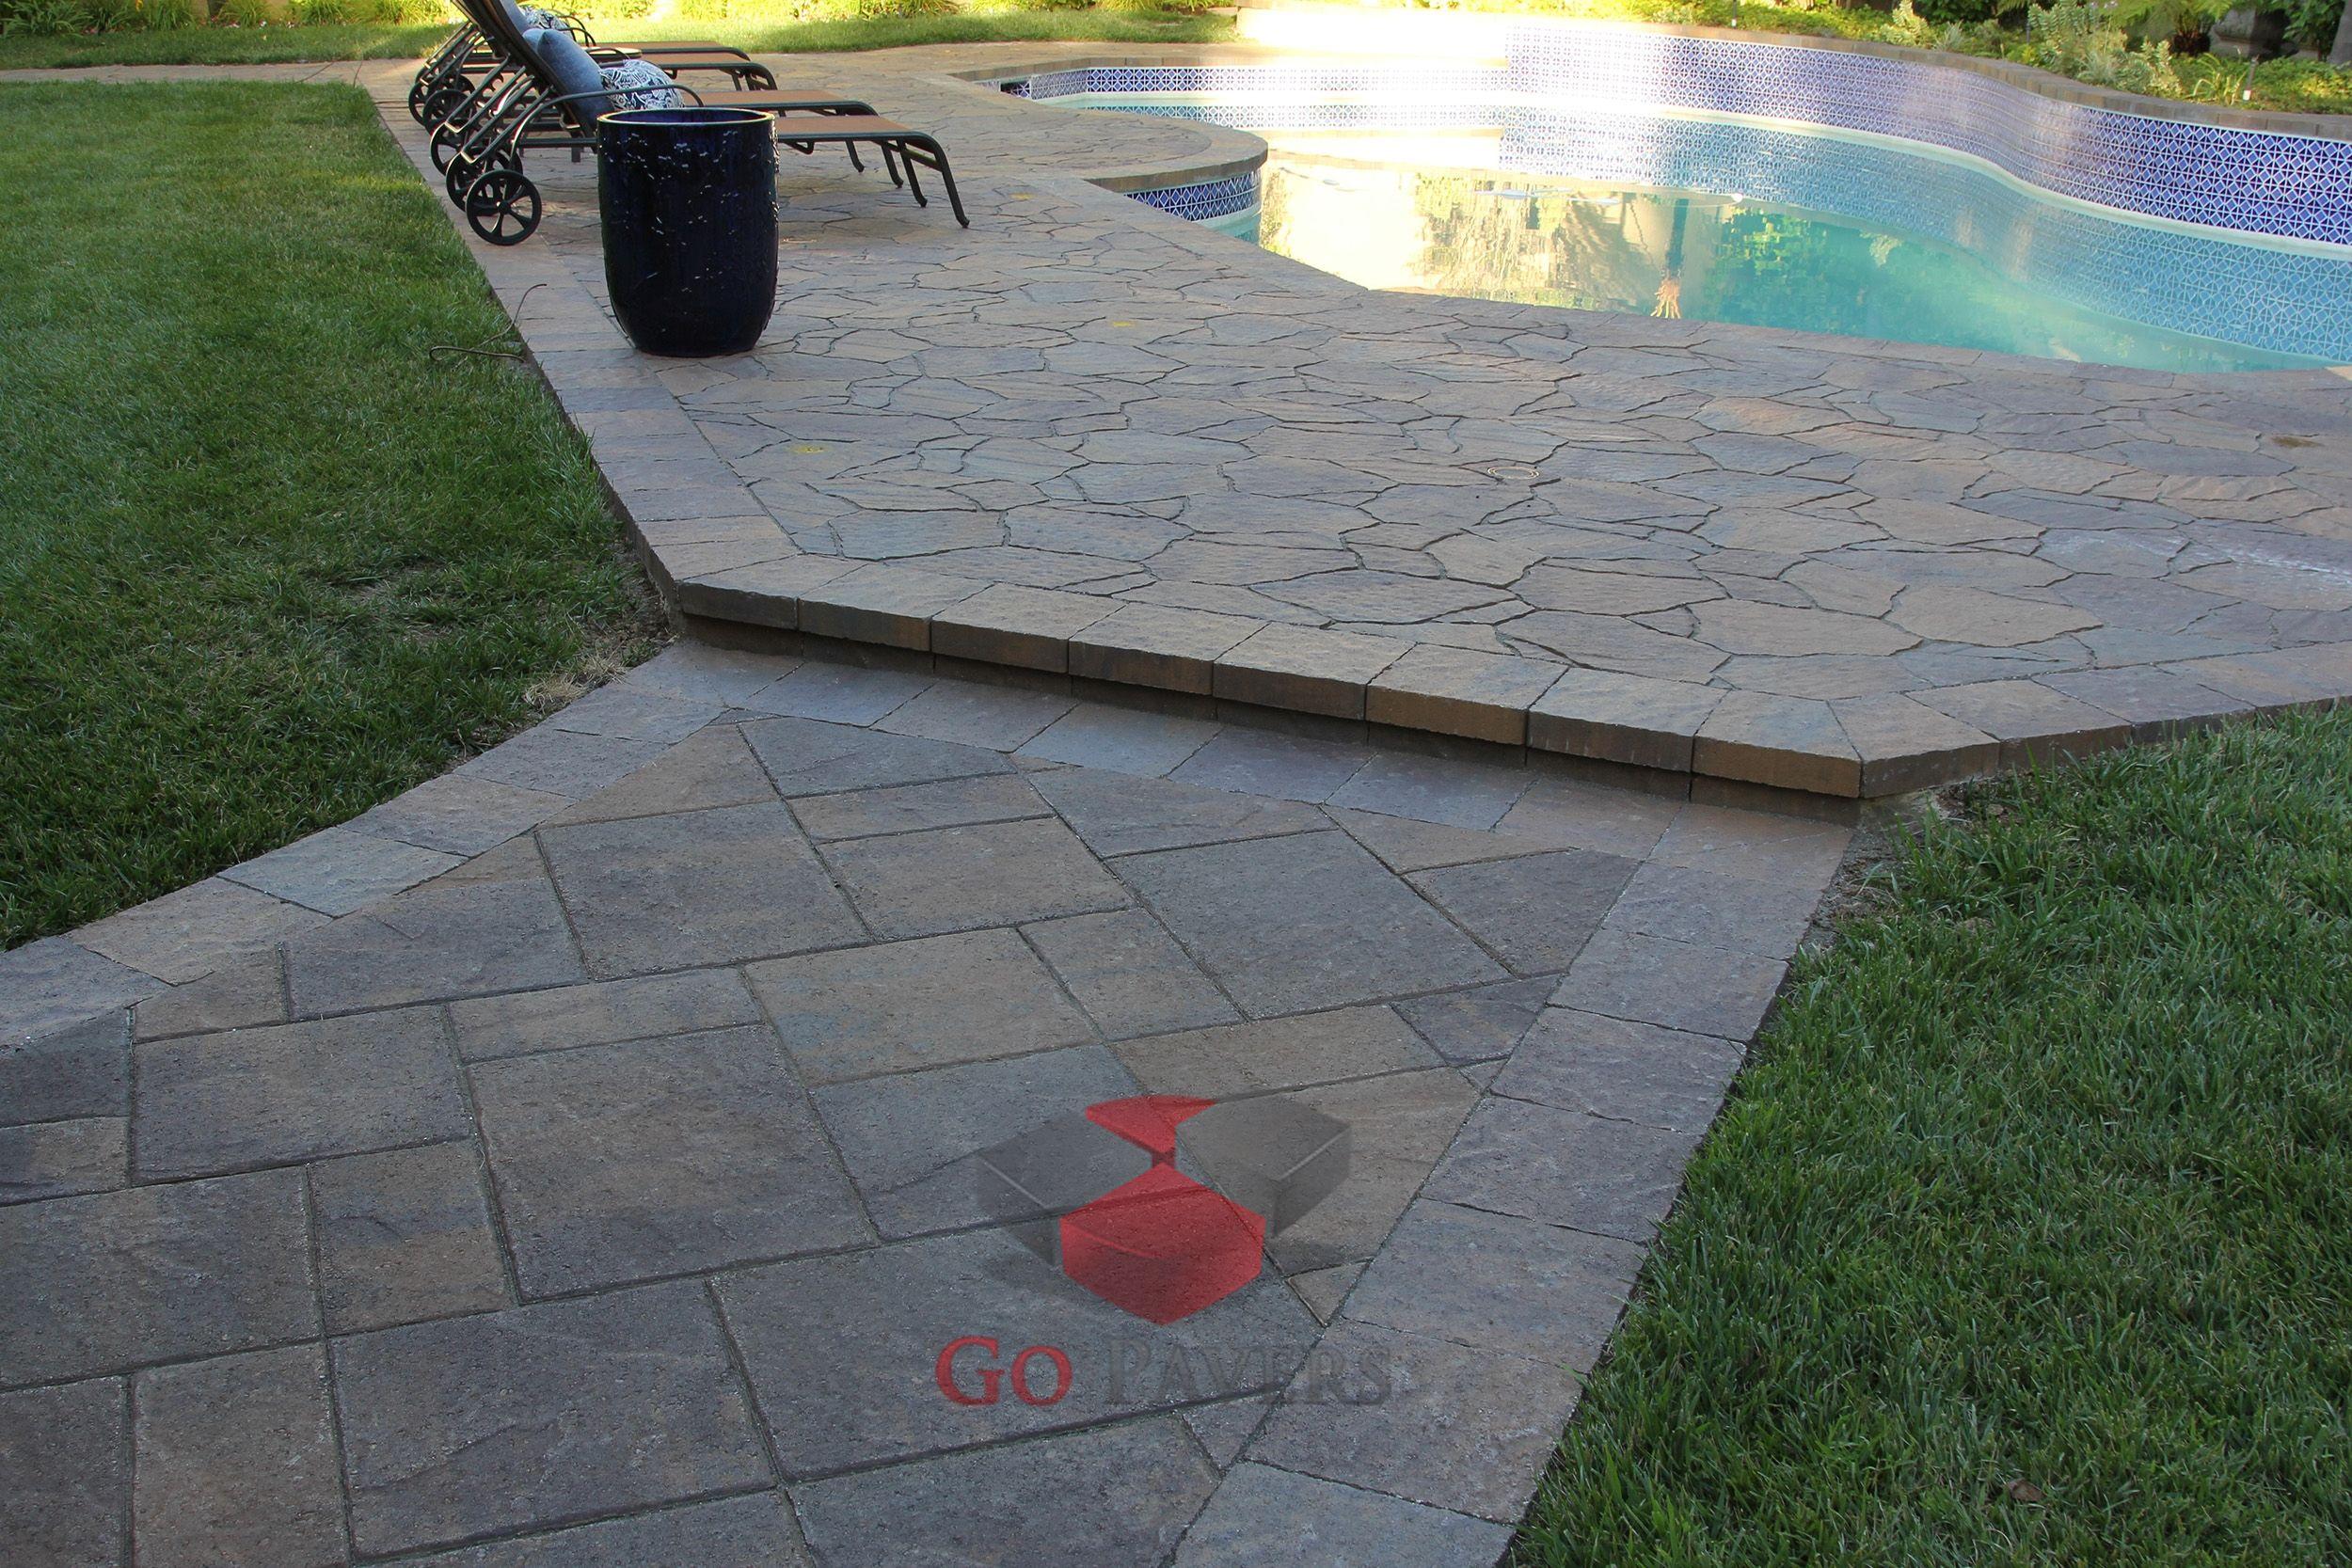 Agoura hills pool belgard arbel and lafitt patio slab toscana color view 11 gopavers com